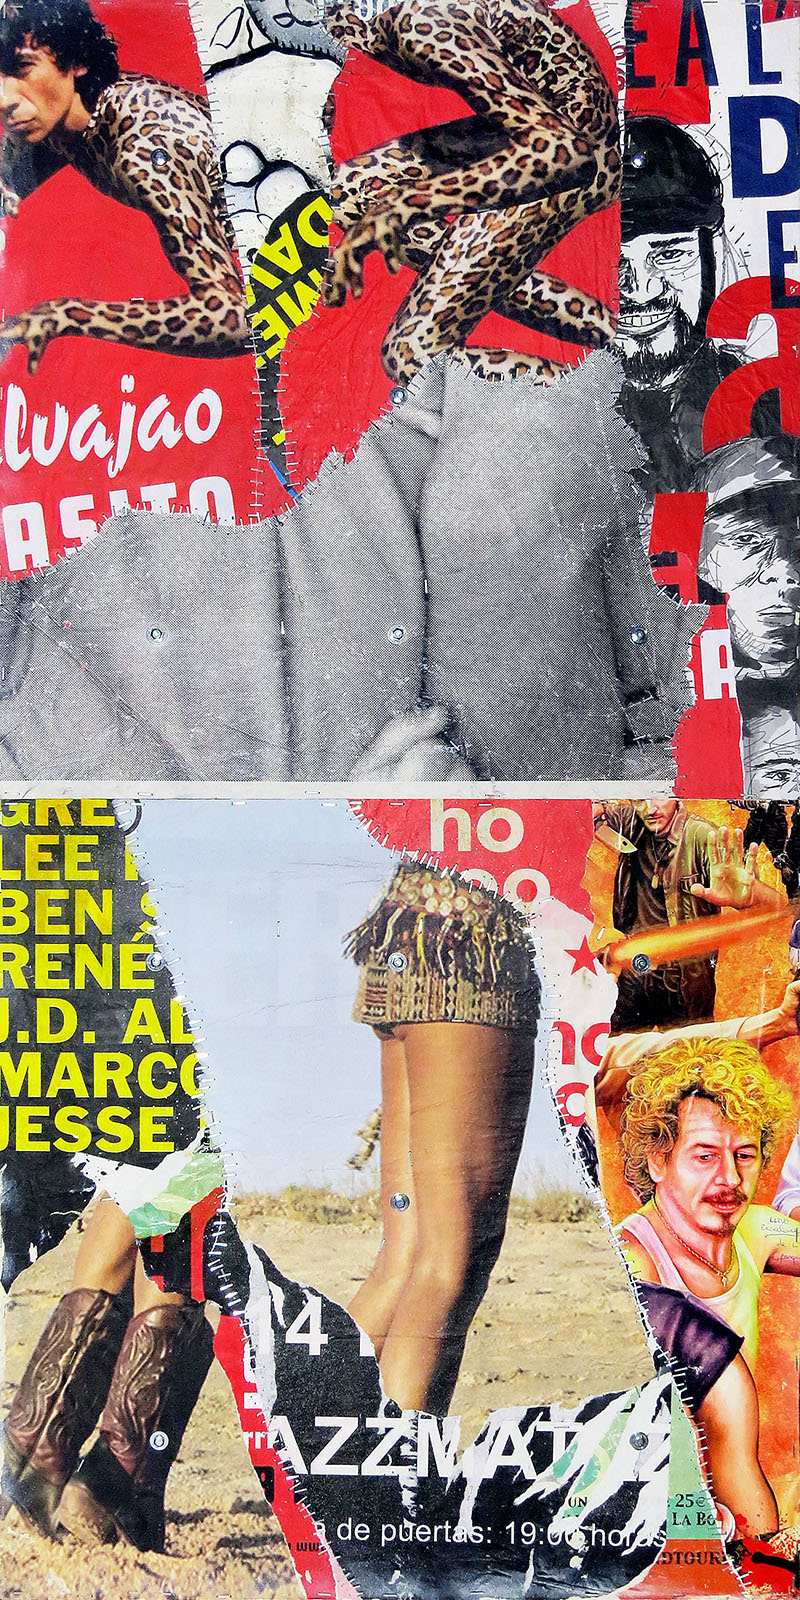 bart-knegt-barcelona-poster-piece-01.jpg